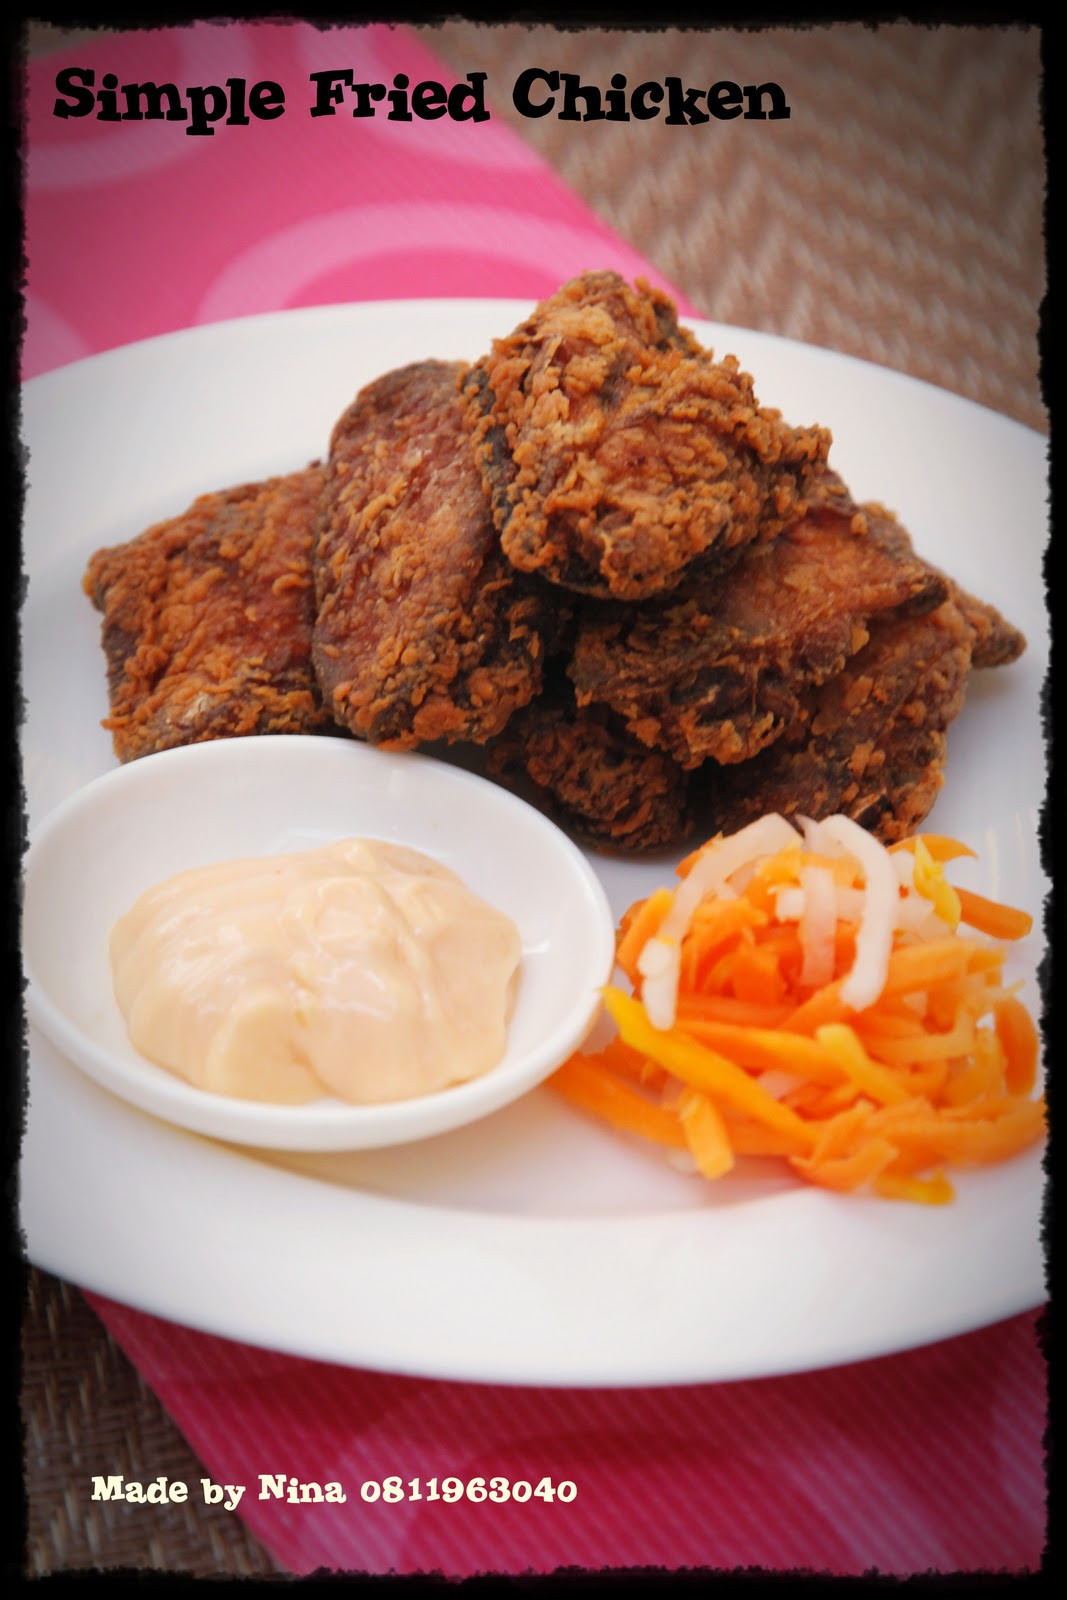 Fried Chicken Recipe Easy  Simple Fried Chicken Recipe — Dishmaps